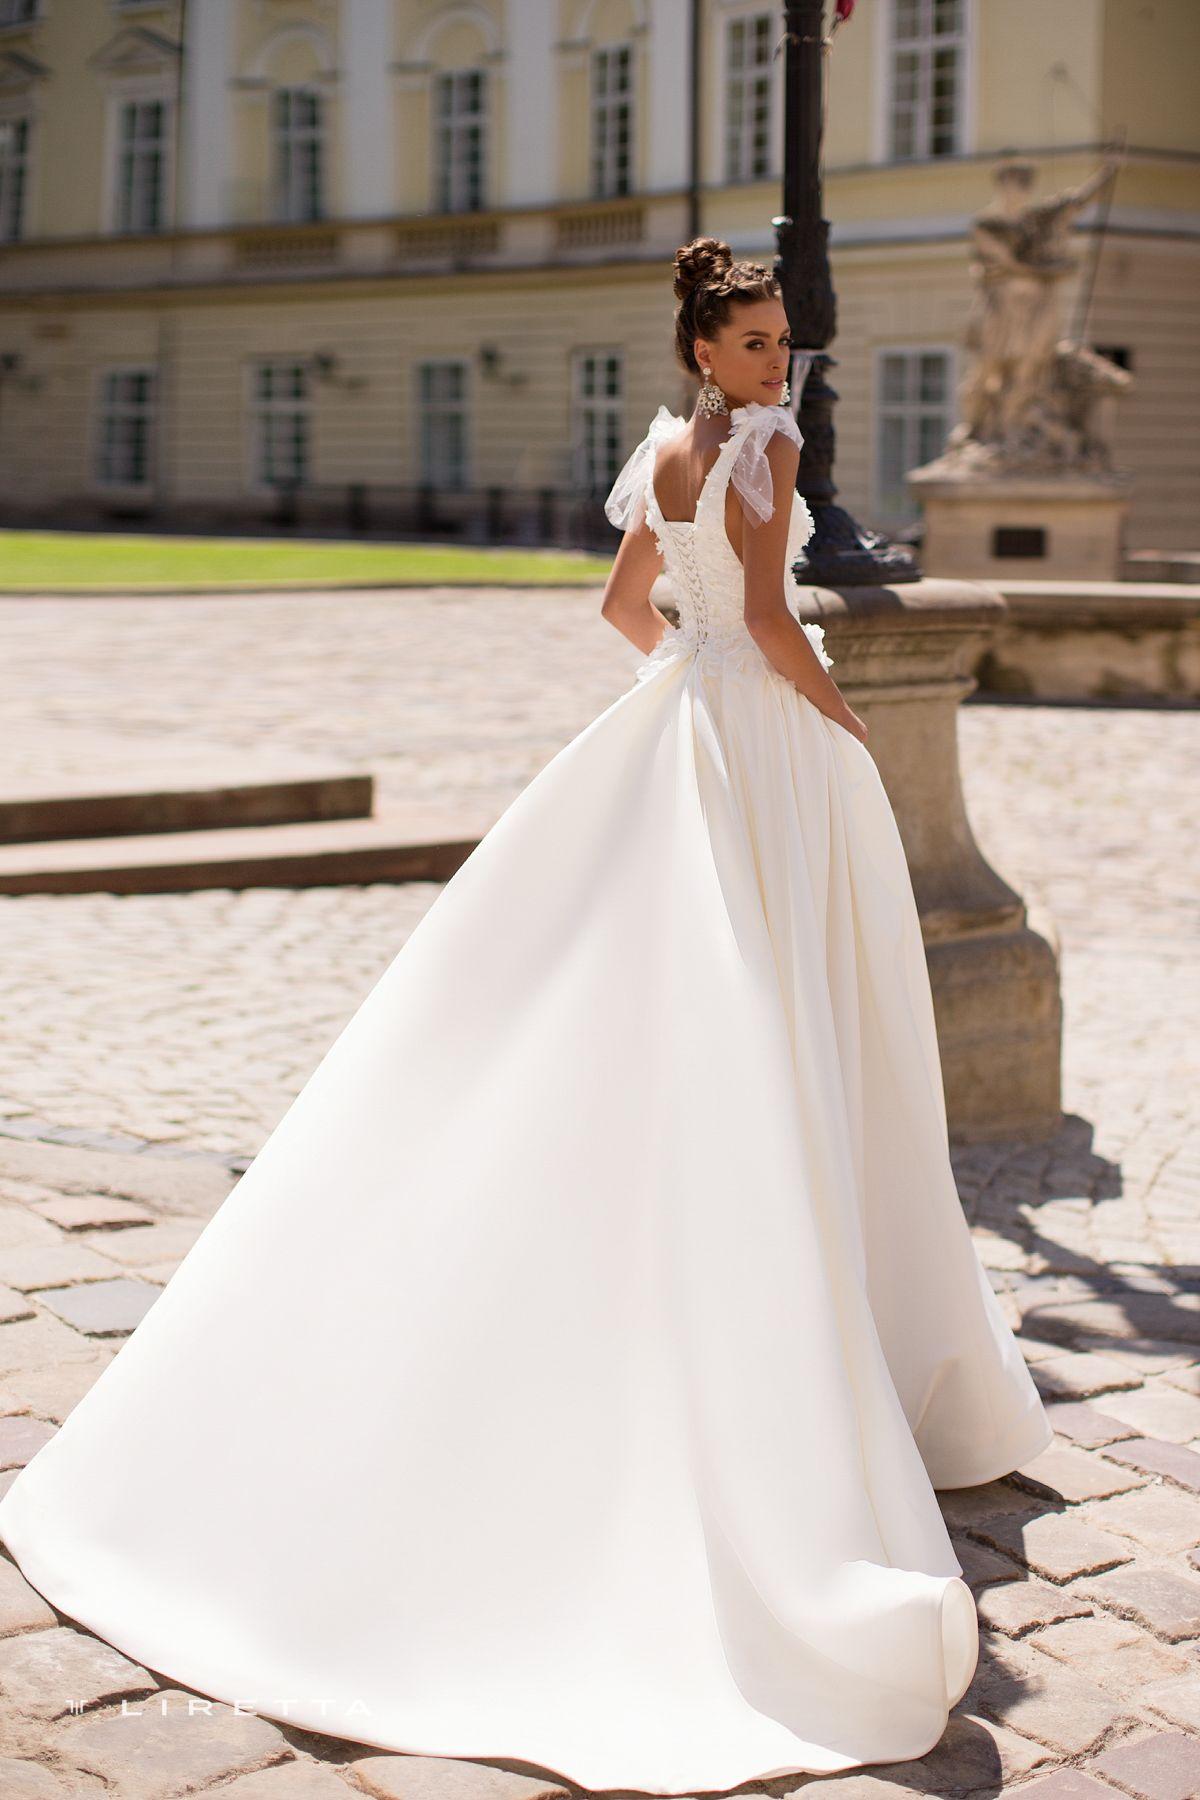 7df73ccb97a Liretta Wedding Dress - Kona White dress Свадебное платье Белое платье